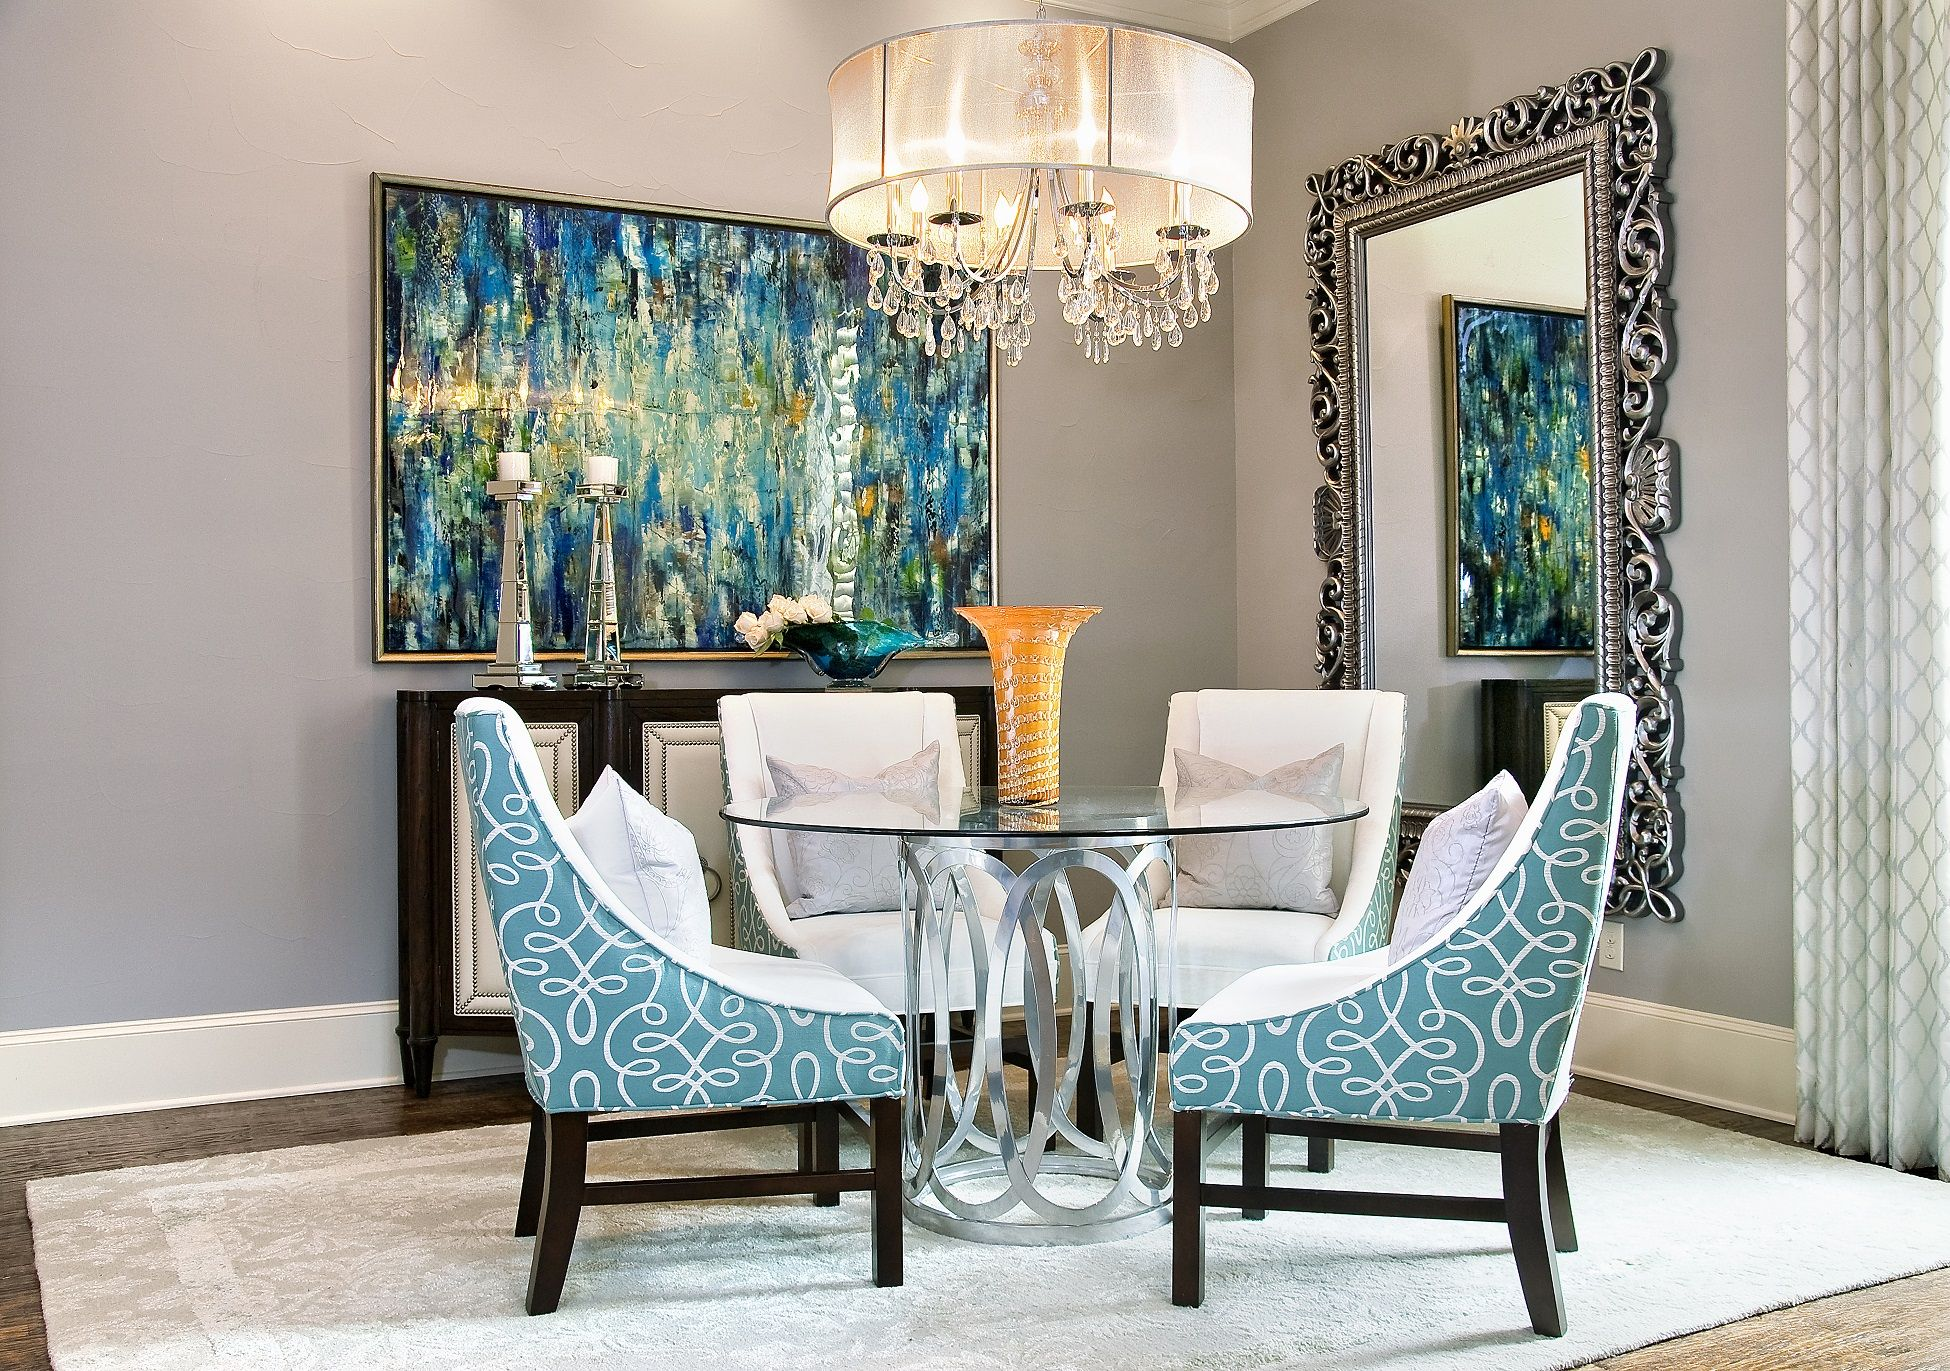 Dive Into a Scuba Diver's Dream Home   5 Organic Foyer & Dining Room Design Ideas 3 - Dallas Interior Designer serving Plano, Frisco, Dallas, Allen for Decorating Den Interiors D'KOR HOME by Dee Frazier Interiors